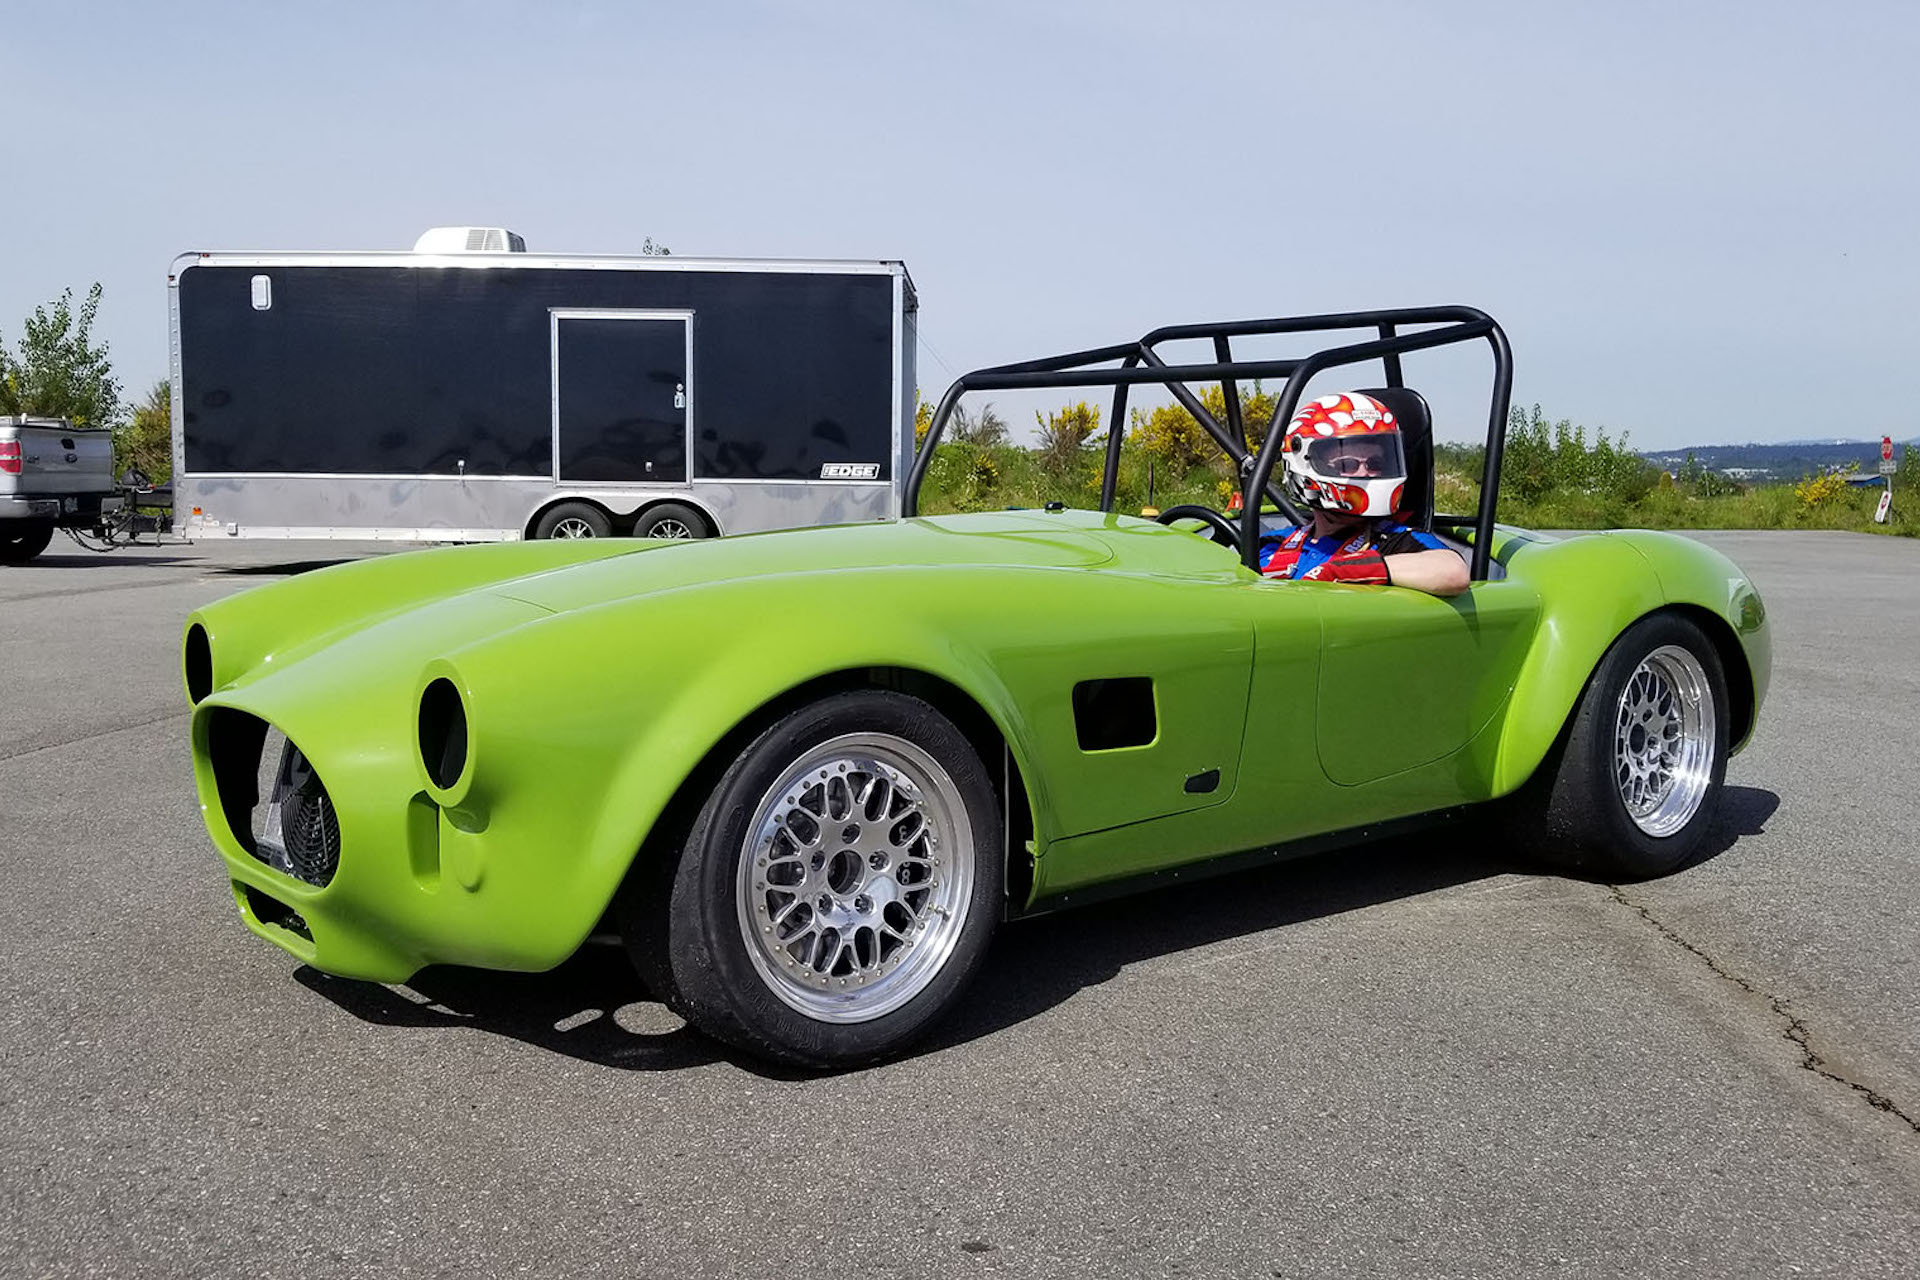 Tesla motor, Shelby Cobra body, Kia battery: watch electric Cobra stun a race crowd